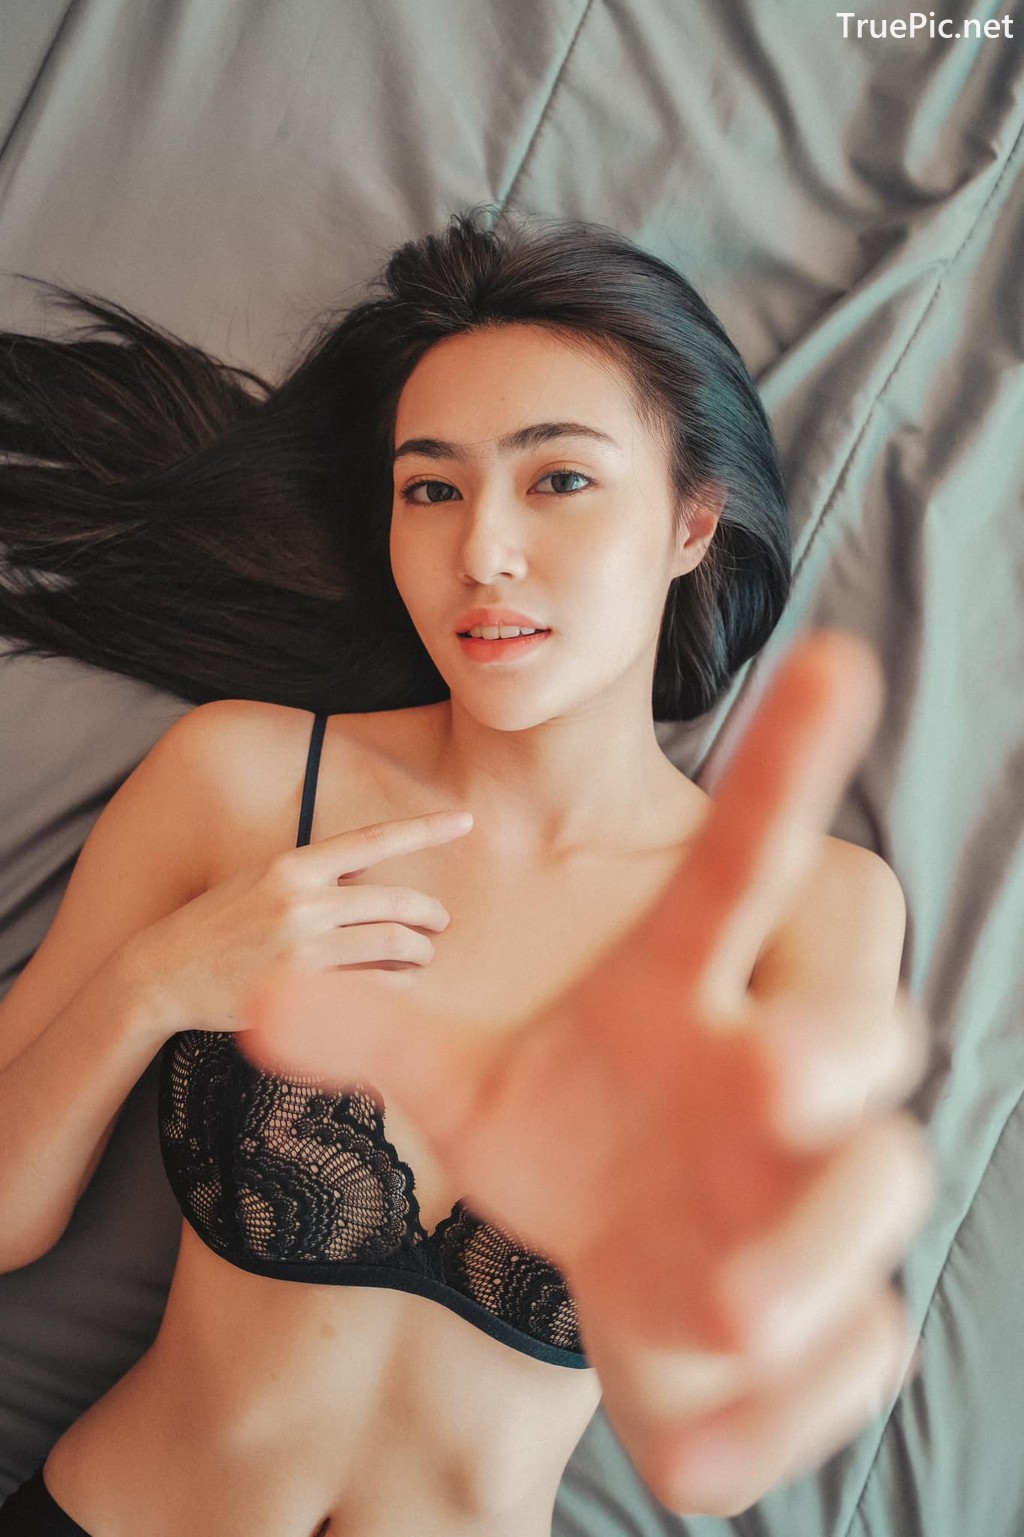 Image Thailand Sexy Model – Baifern Rinrucha Kamnark – Black Lingerie - TruePic.net - Picture-10